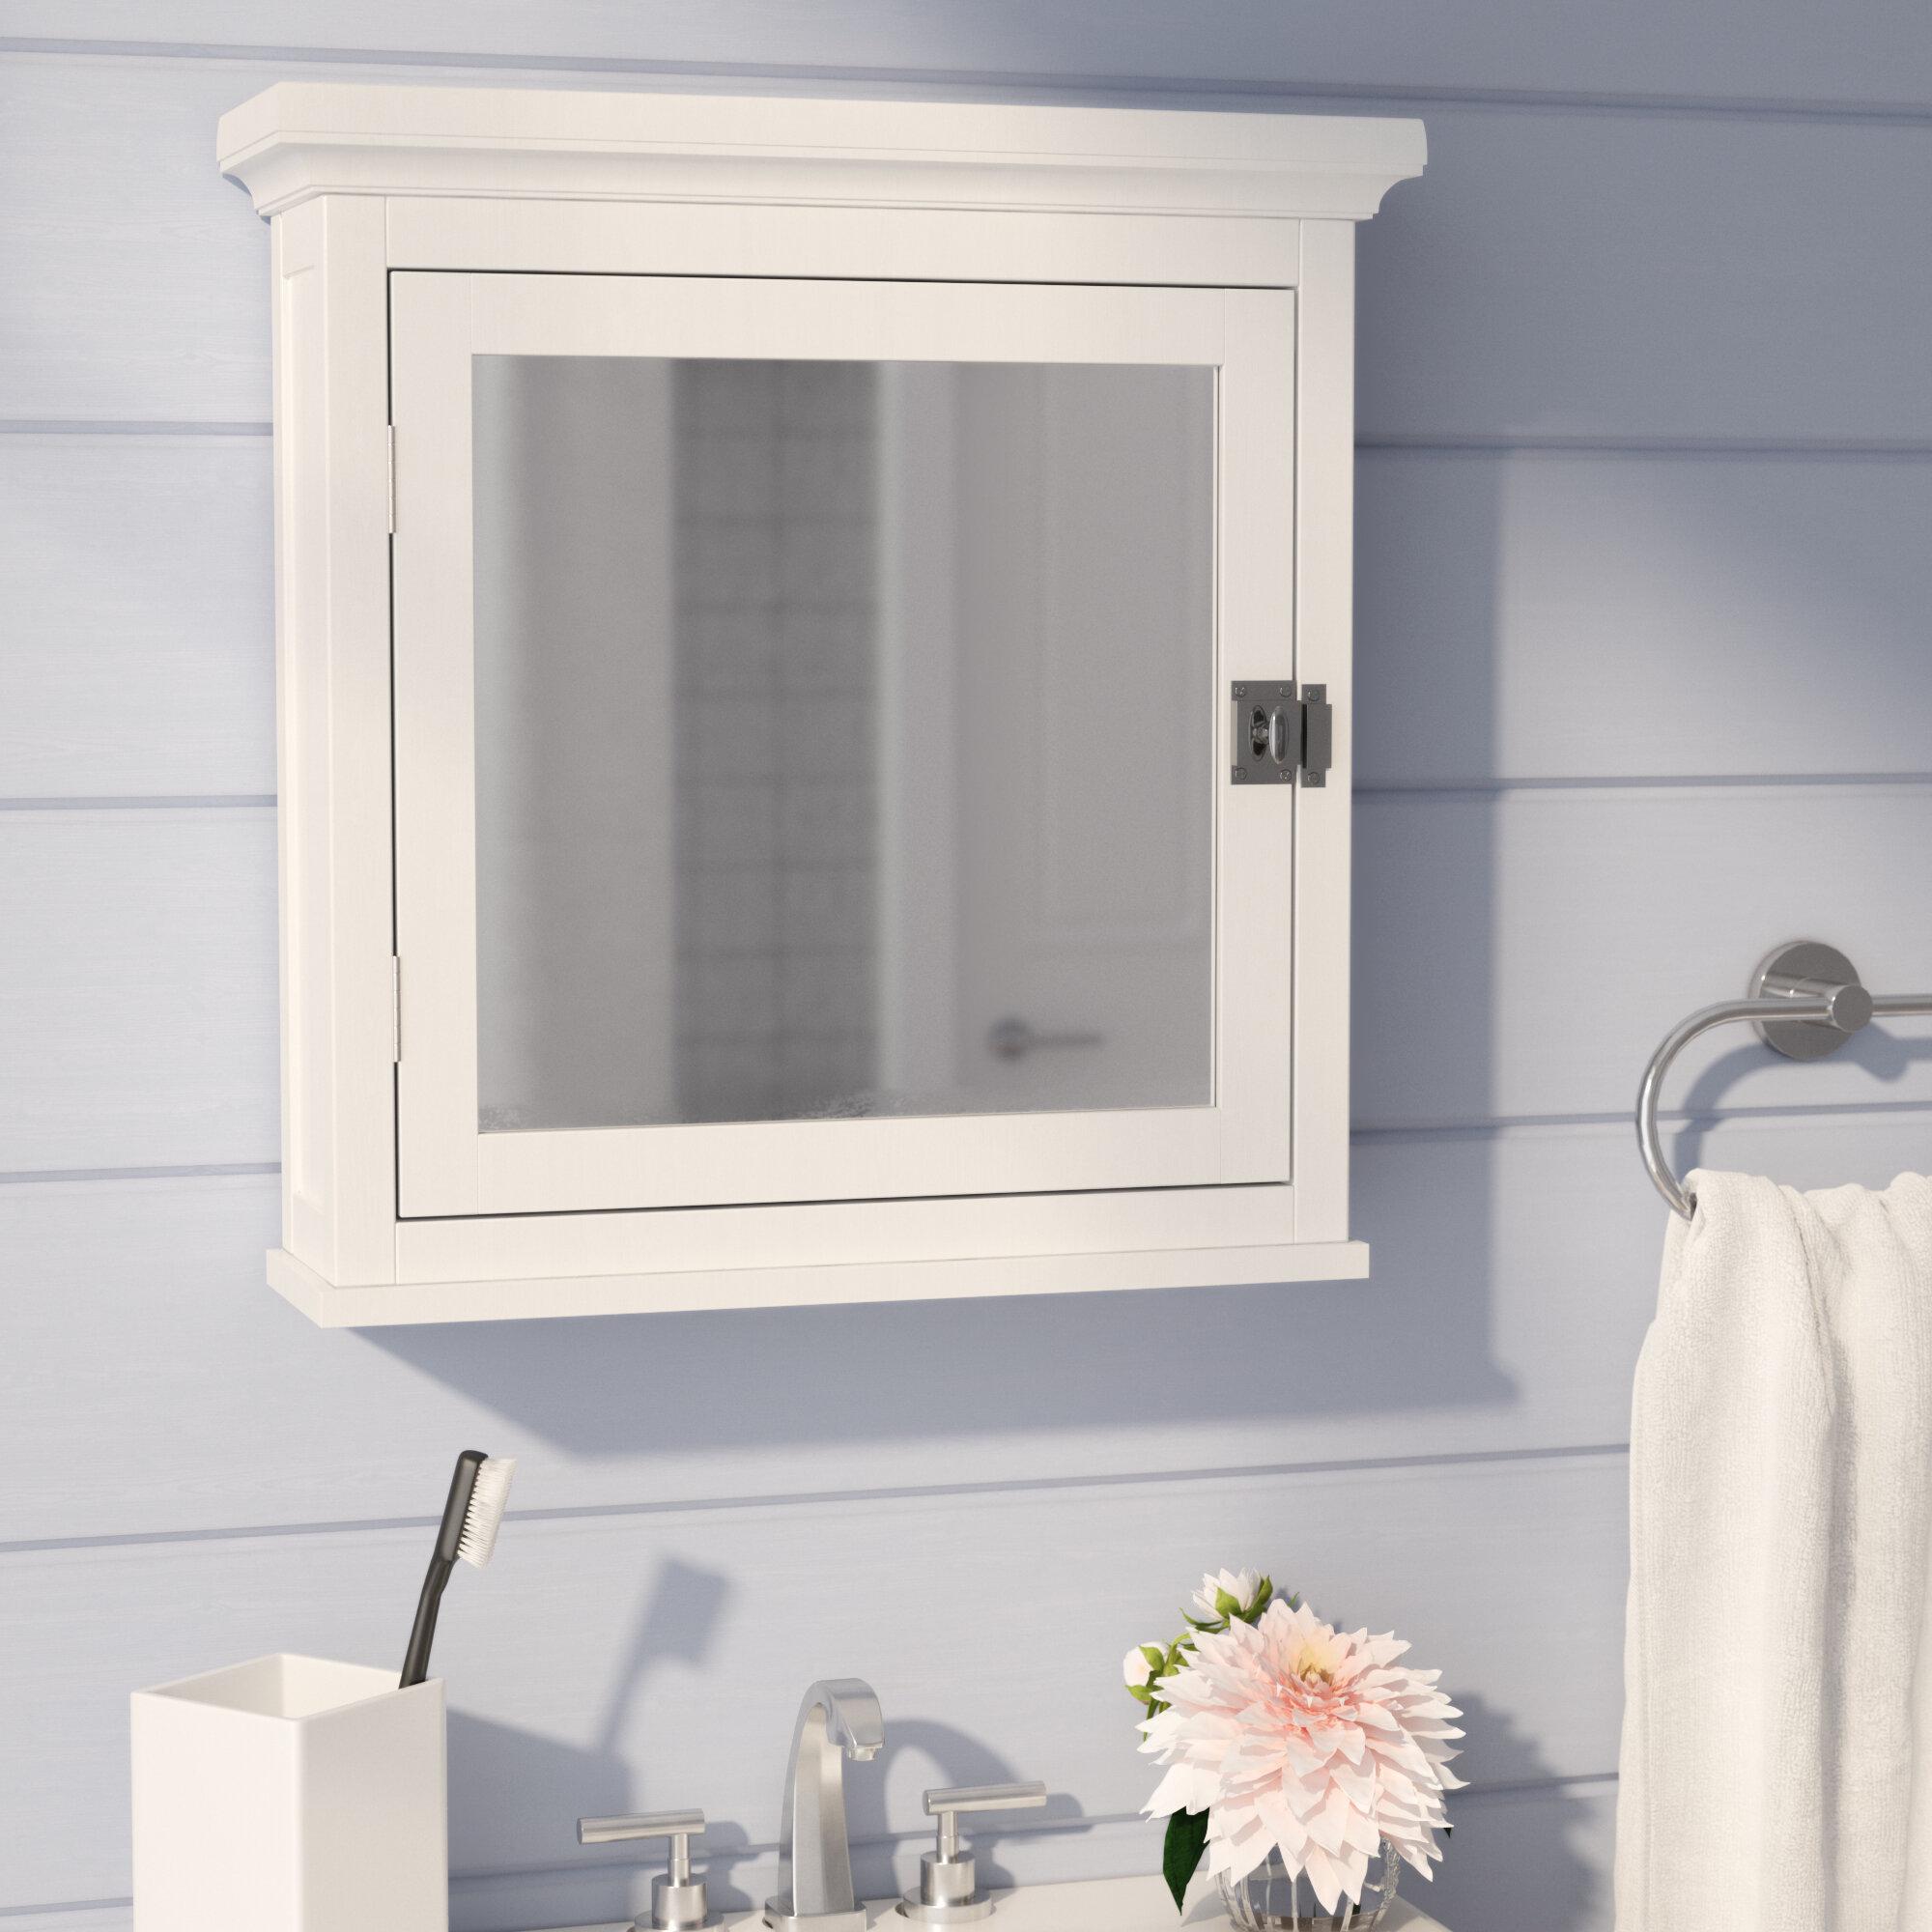 Beachcrest Home Sumter Surface Mount Medicine Cabinet & Reviews